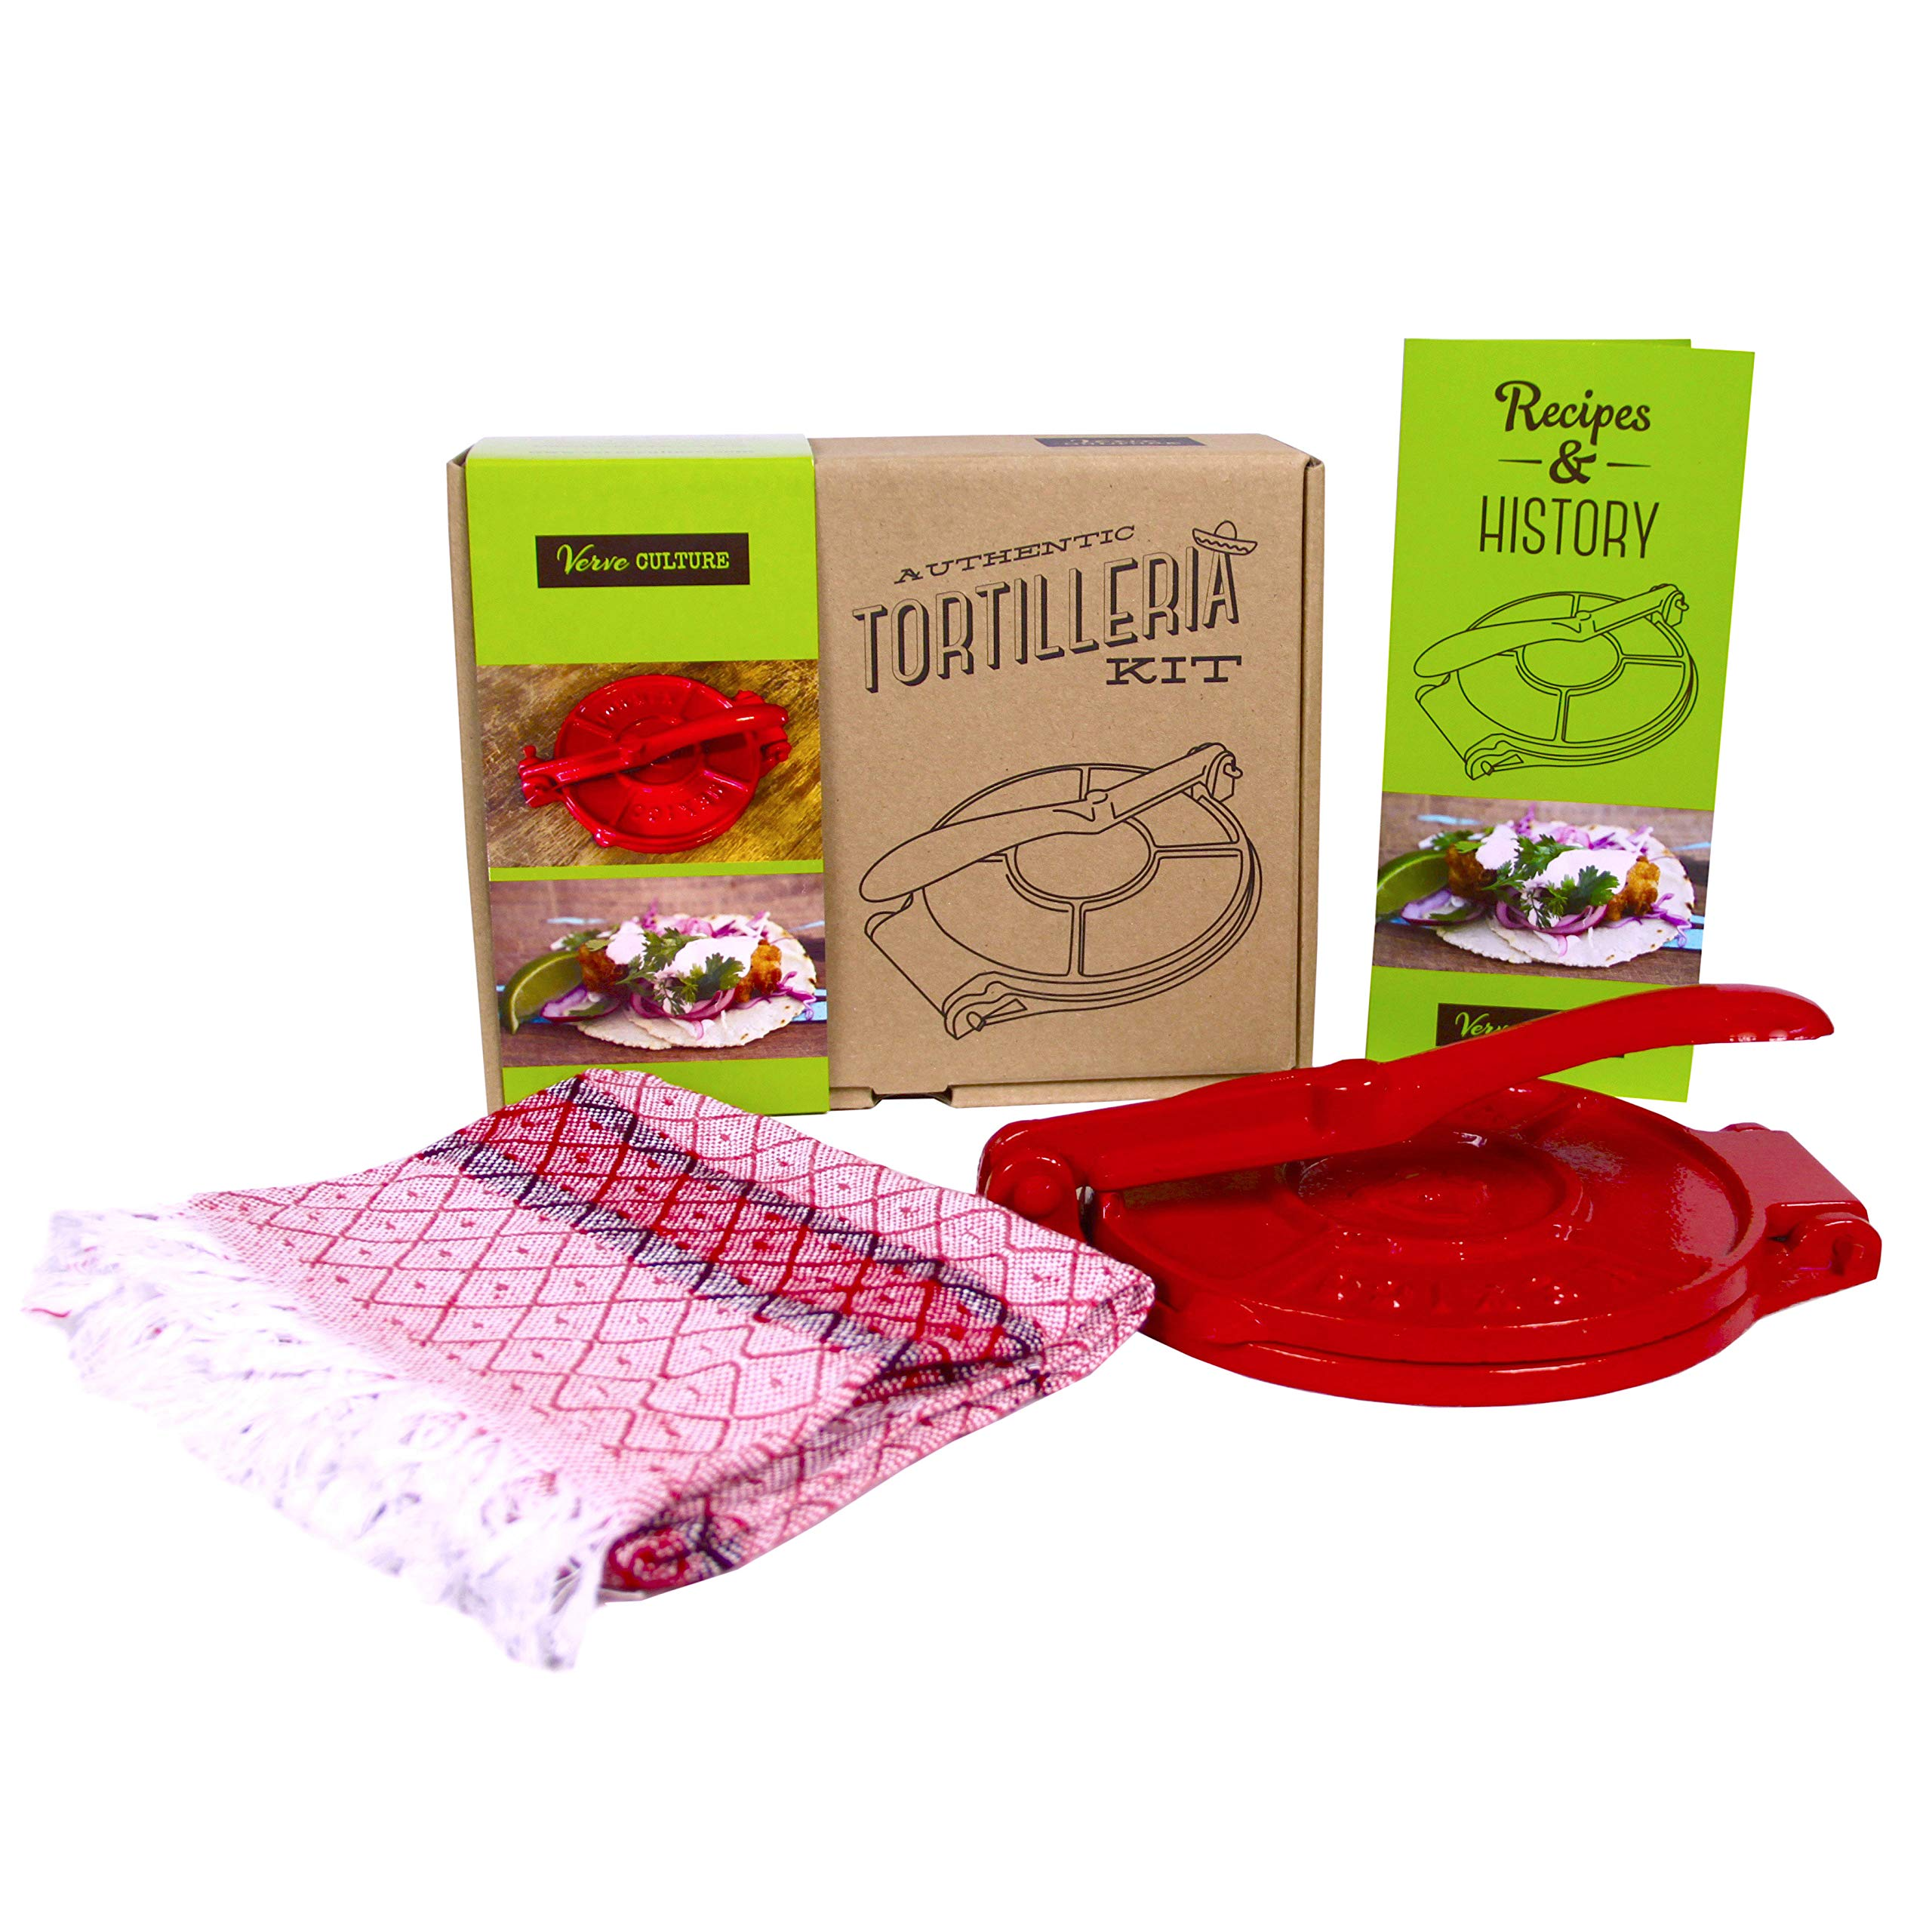 Verve Culture Artisan Tortilleria Kit - 8'' Cast Iron Tortilla Press by Verve CULTURE